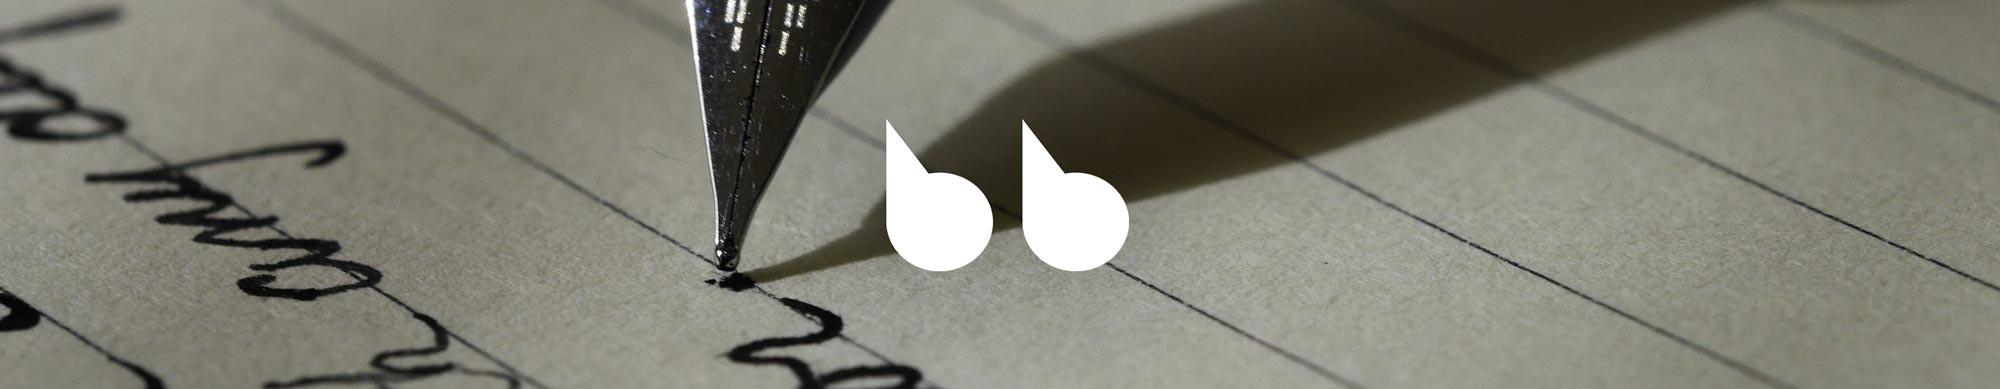 "Consejos para la parte de ""writing"" del examen del B2 (First)"